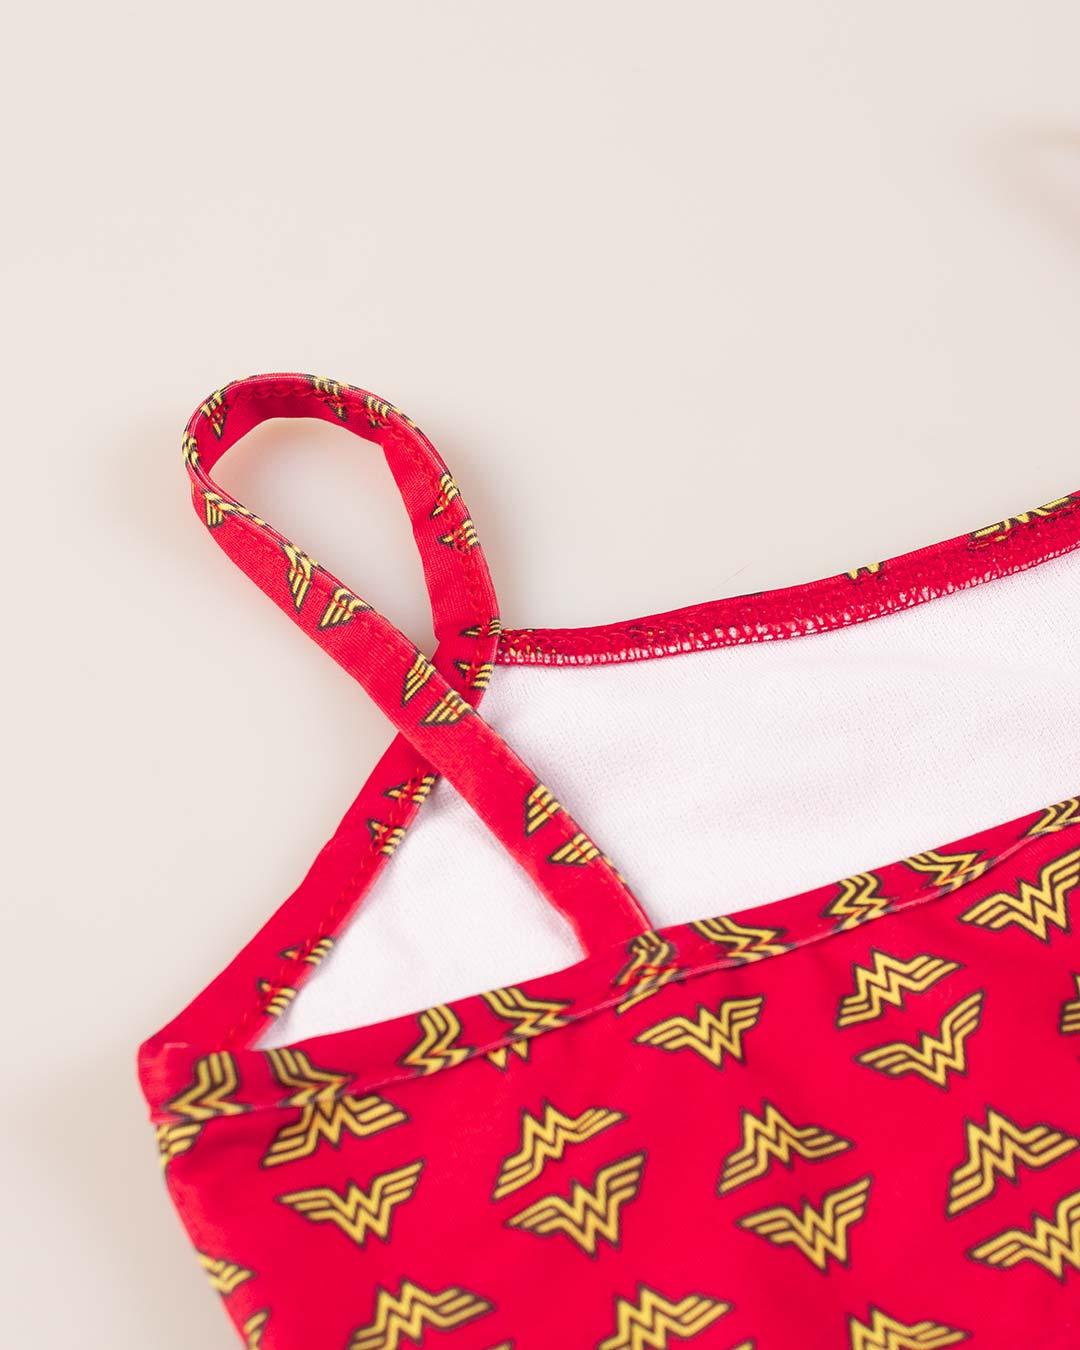 Biquini Infantil Wonder Woman Vermelho - VNT